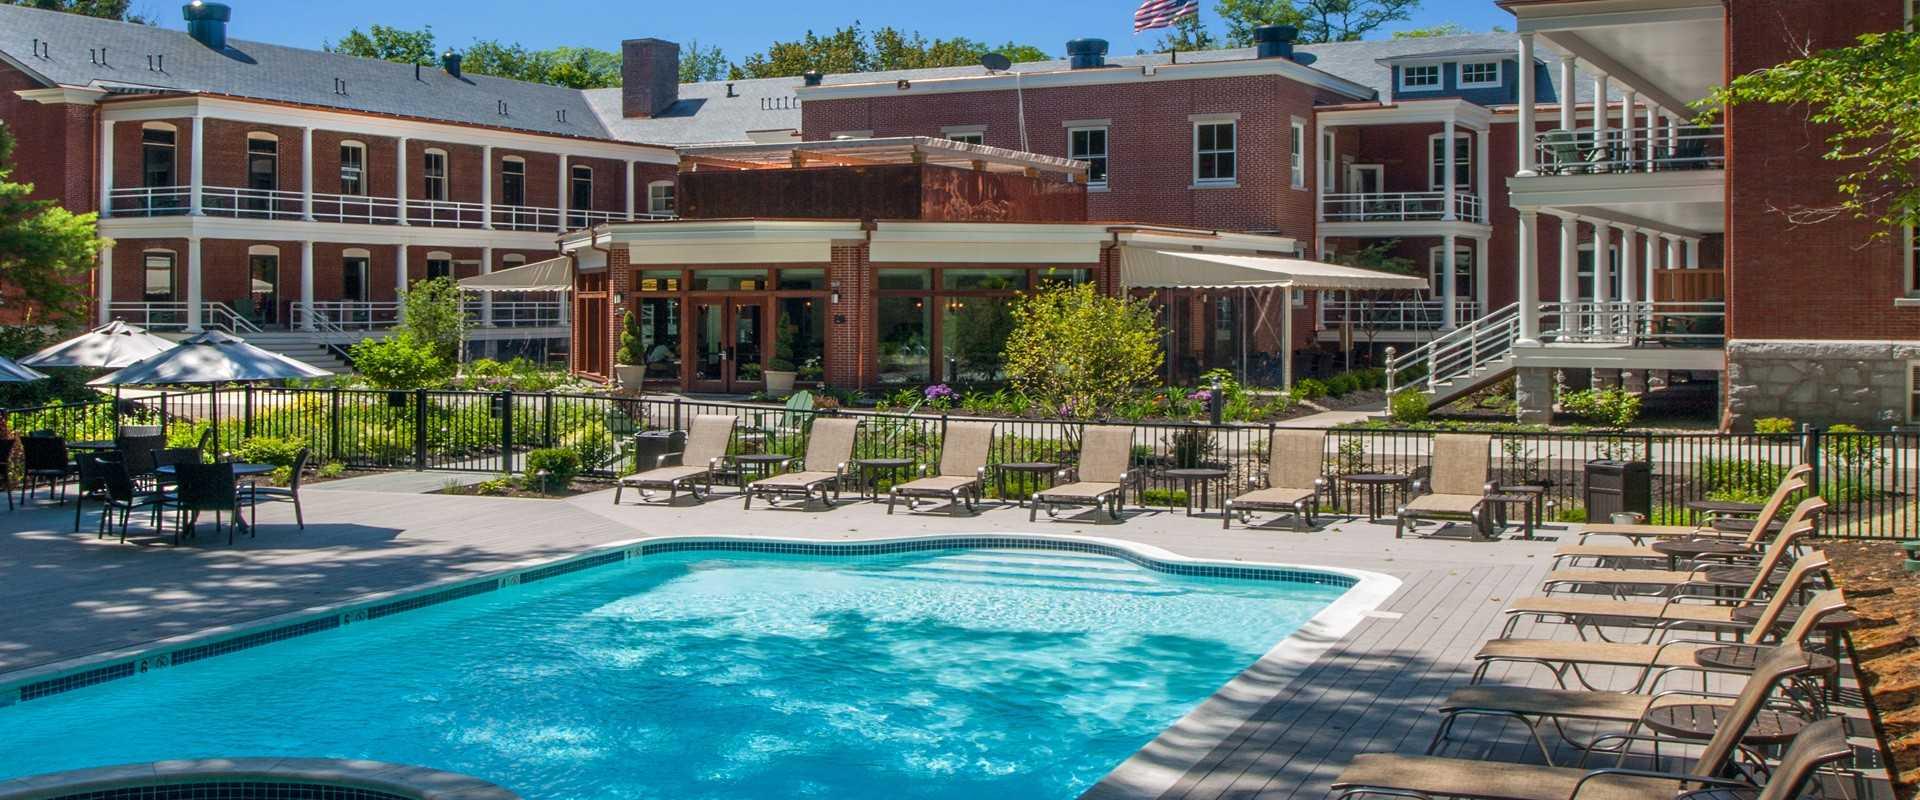 inn at diamond cove portland maine hotel portland hotel. Black Bedroom Furniture Sets. Home Design Ideas